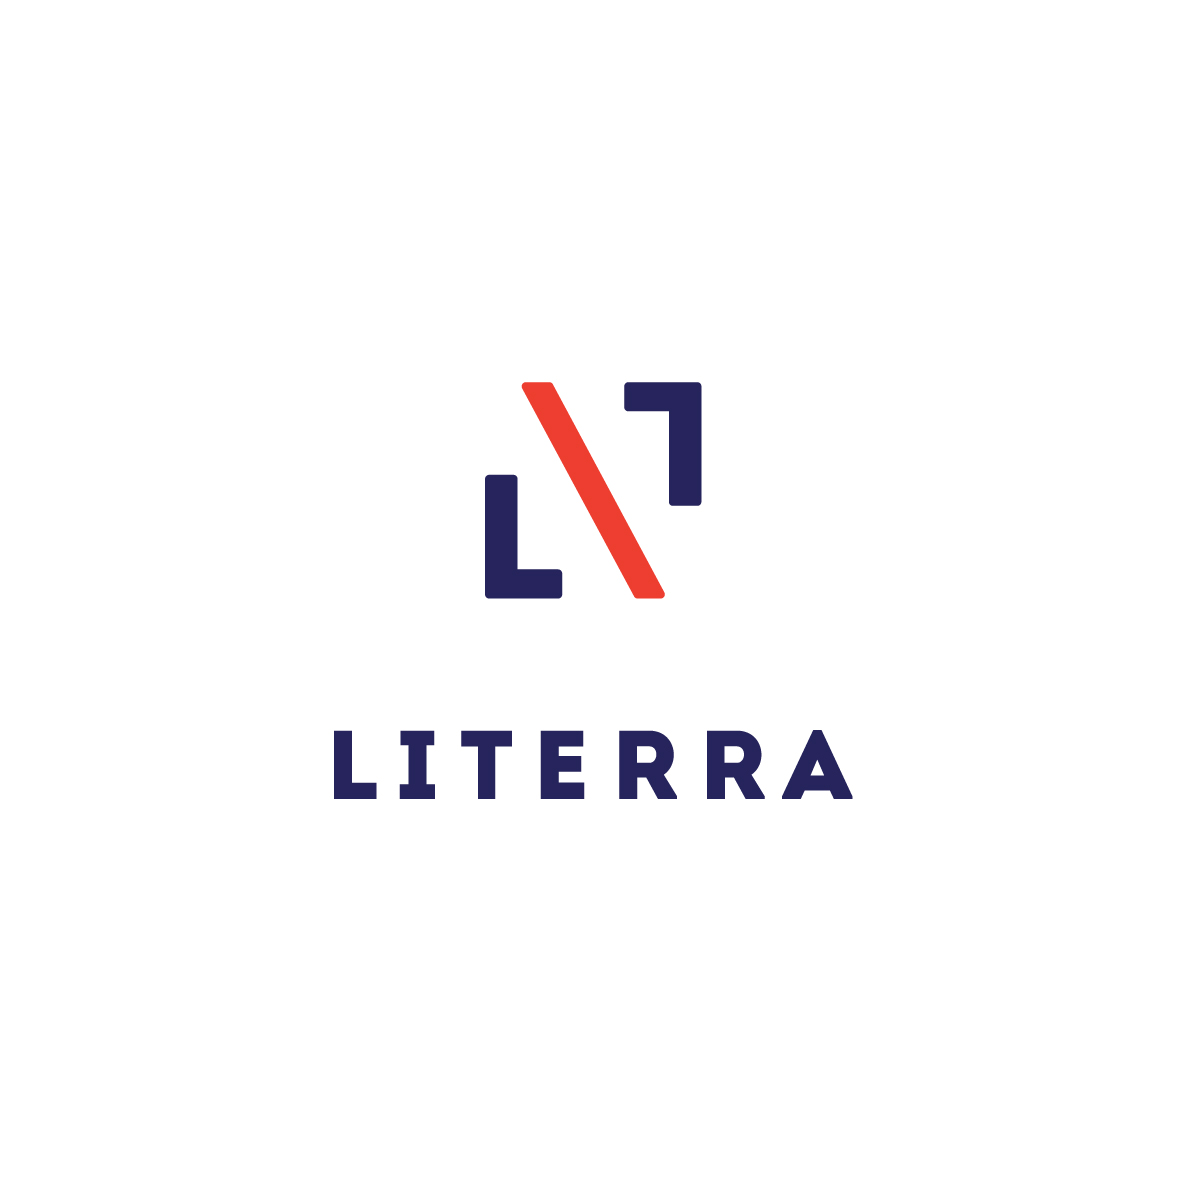 literra-logo-final-01